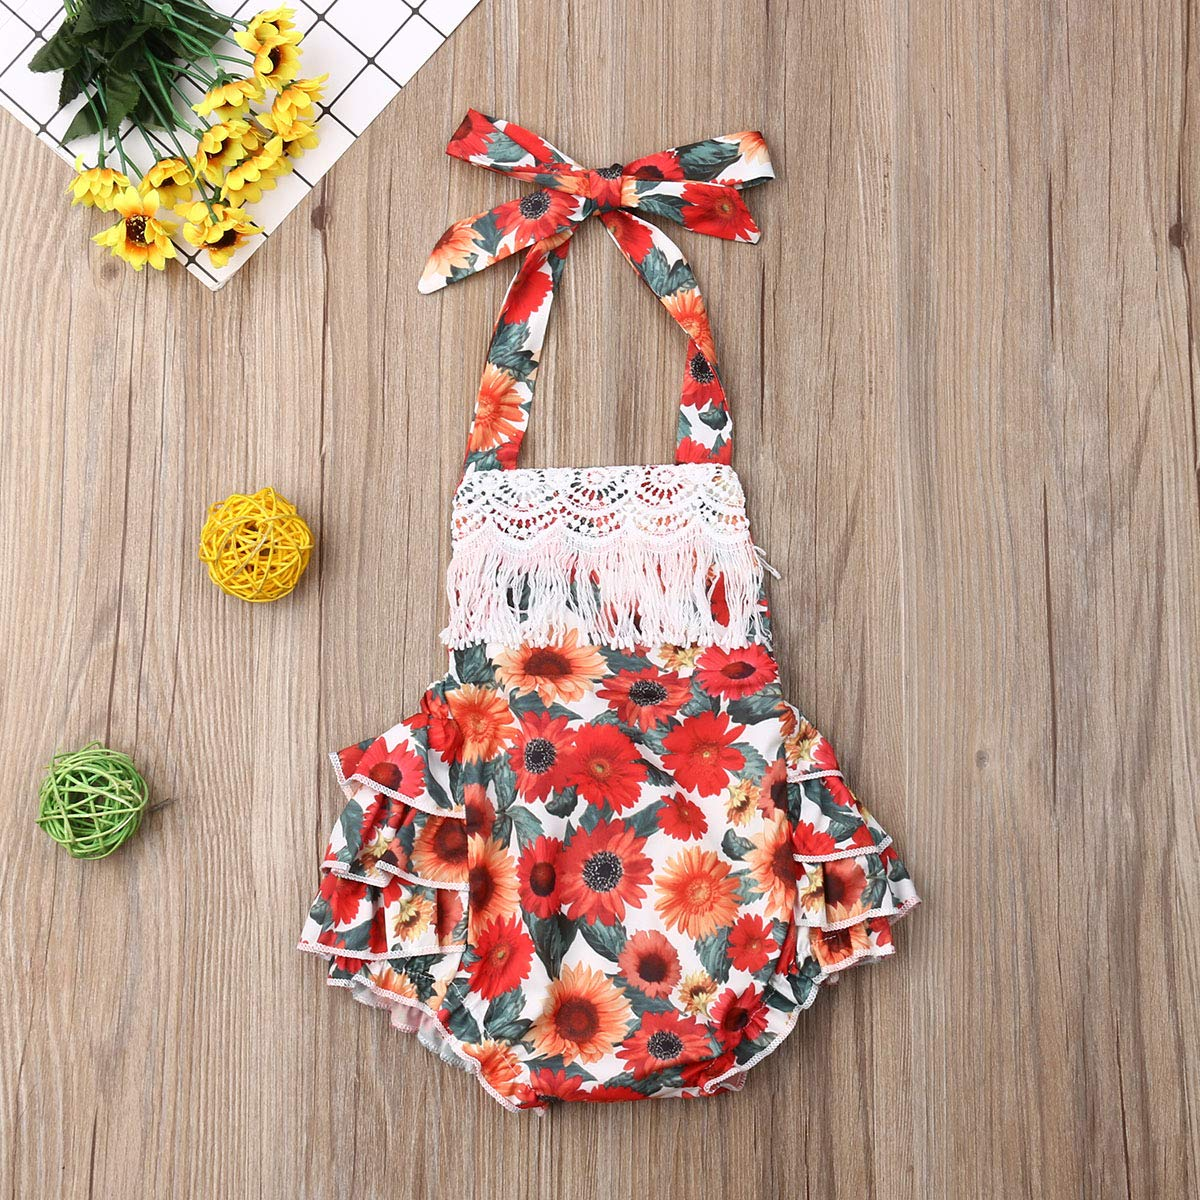 Newborn Baby Girls Sunflower Clothes Halter Tassel Floral Romper Bodysuit Ruffle Skirt Jumpsuit Outfits